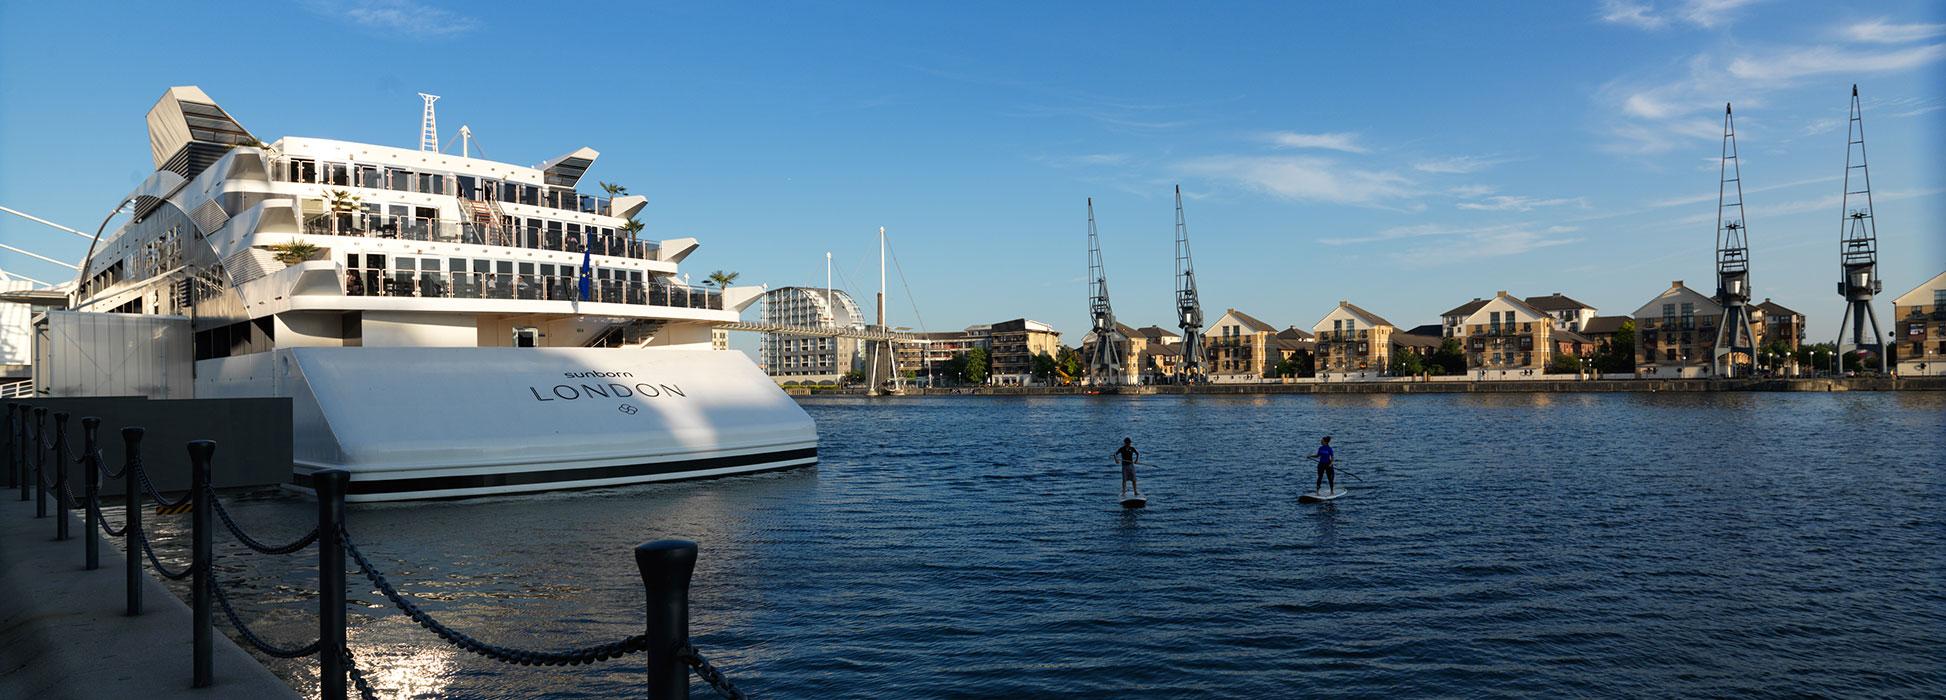 London Superyacht Hotel